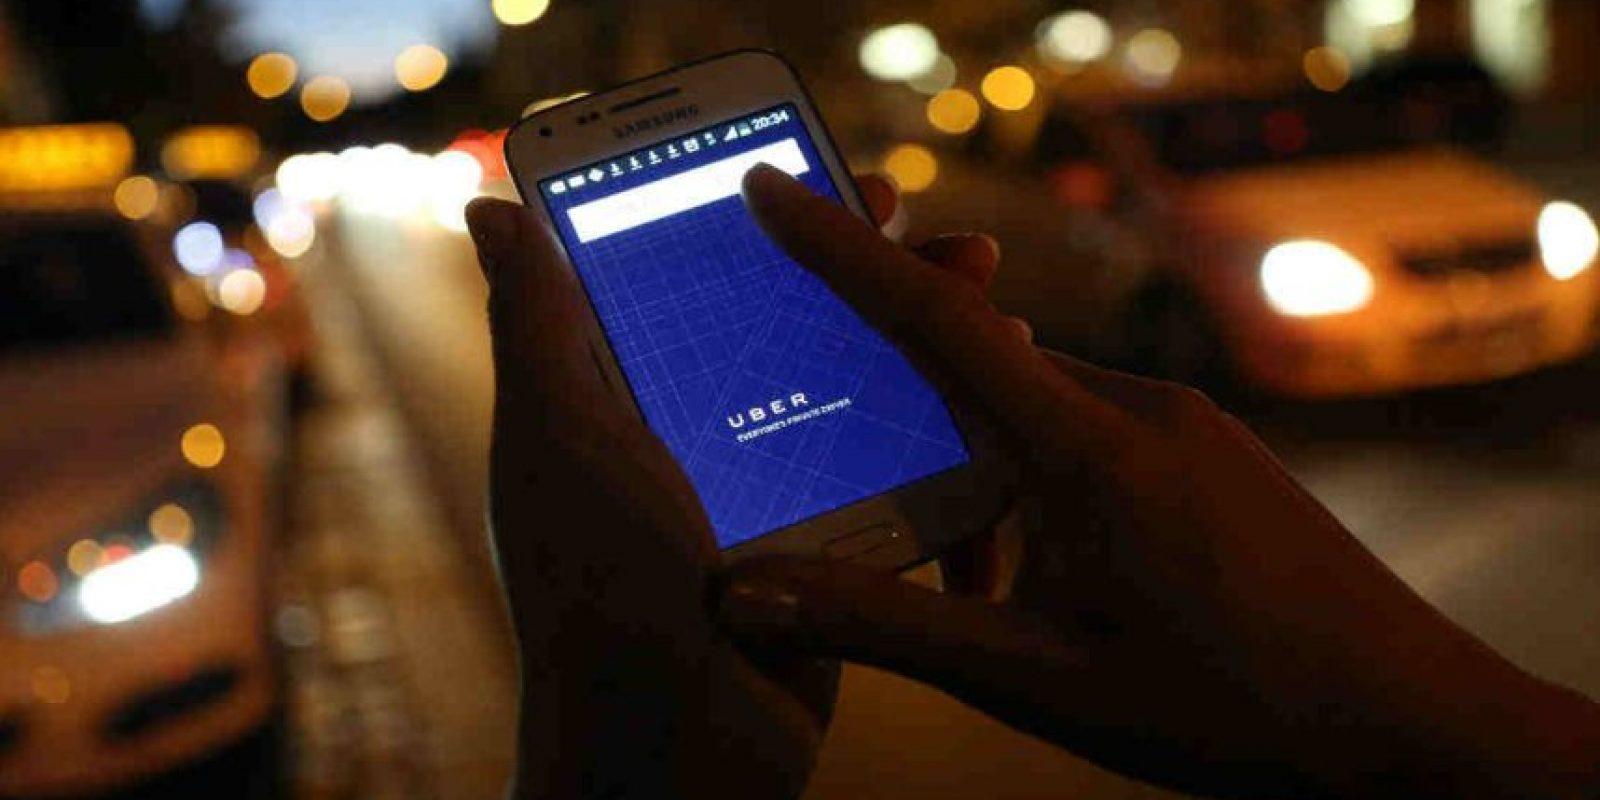 Para registrarse necesitan tarjeta bancaria. Foto:Getty Images